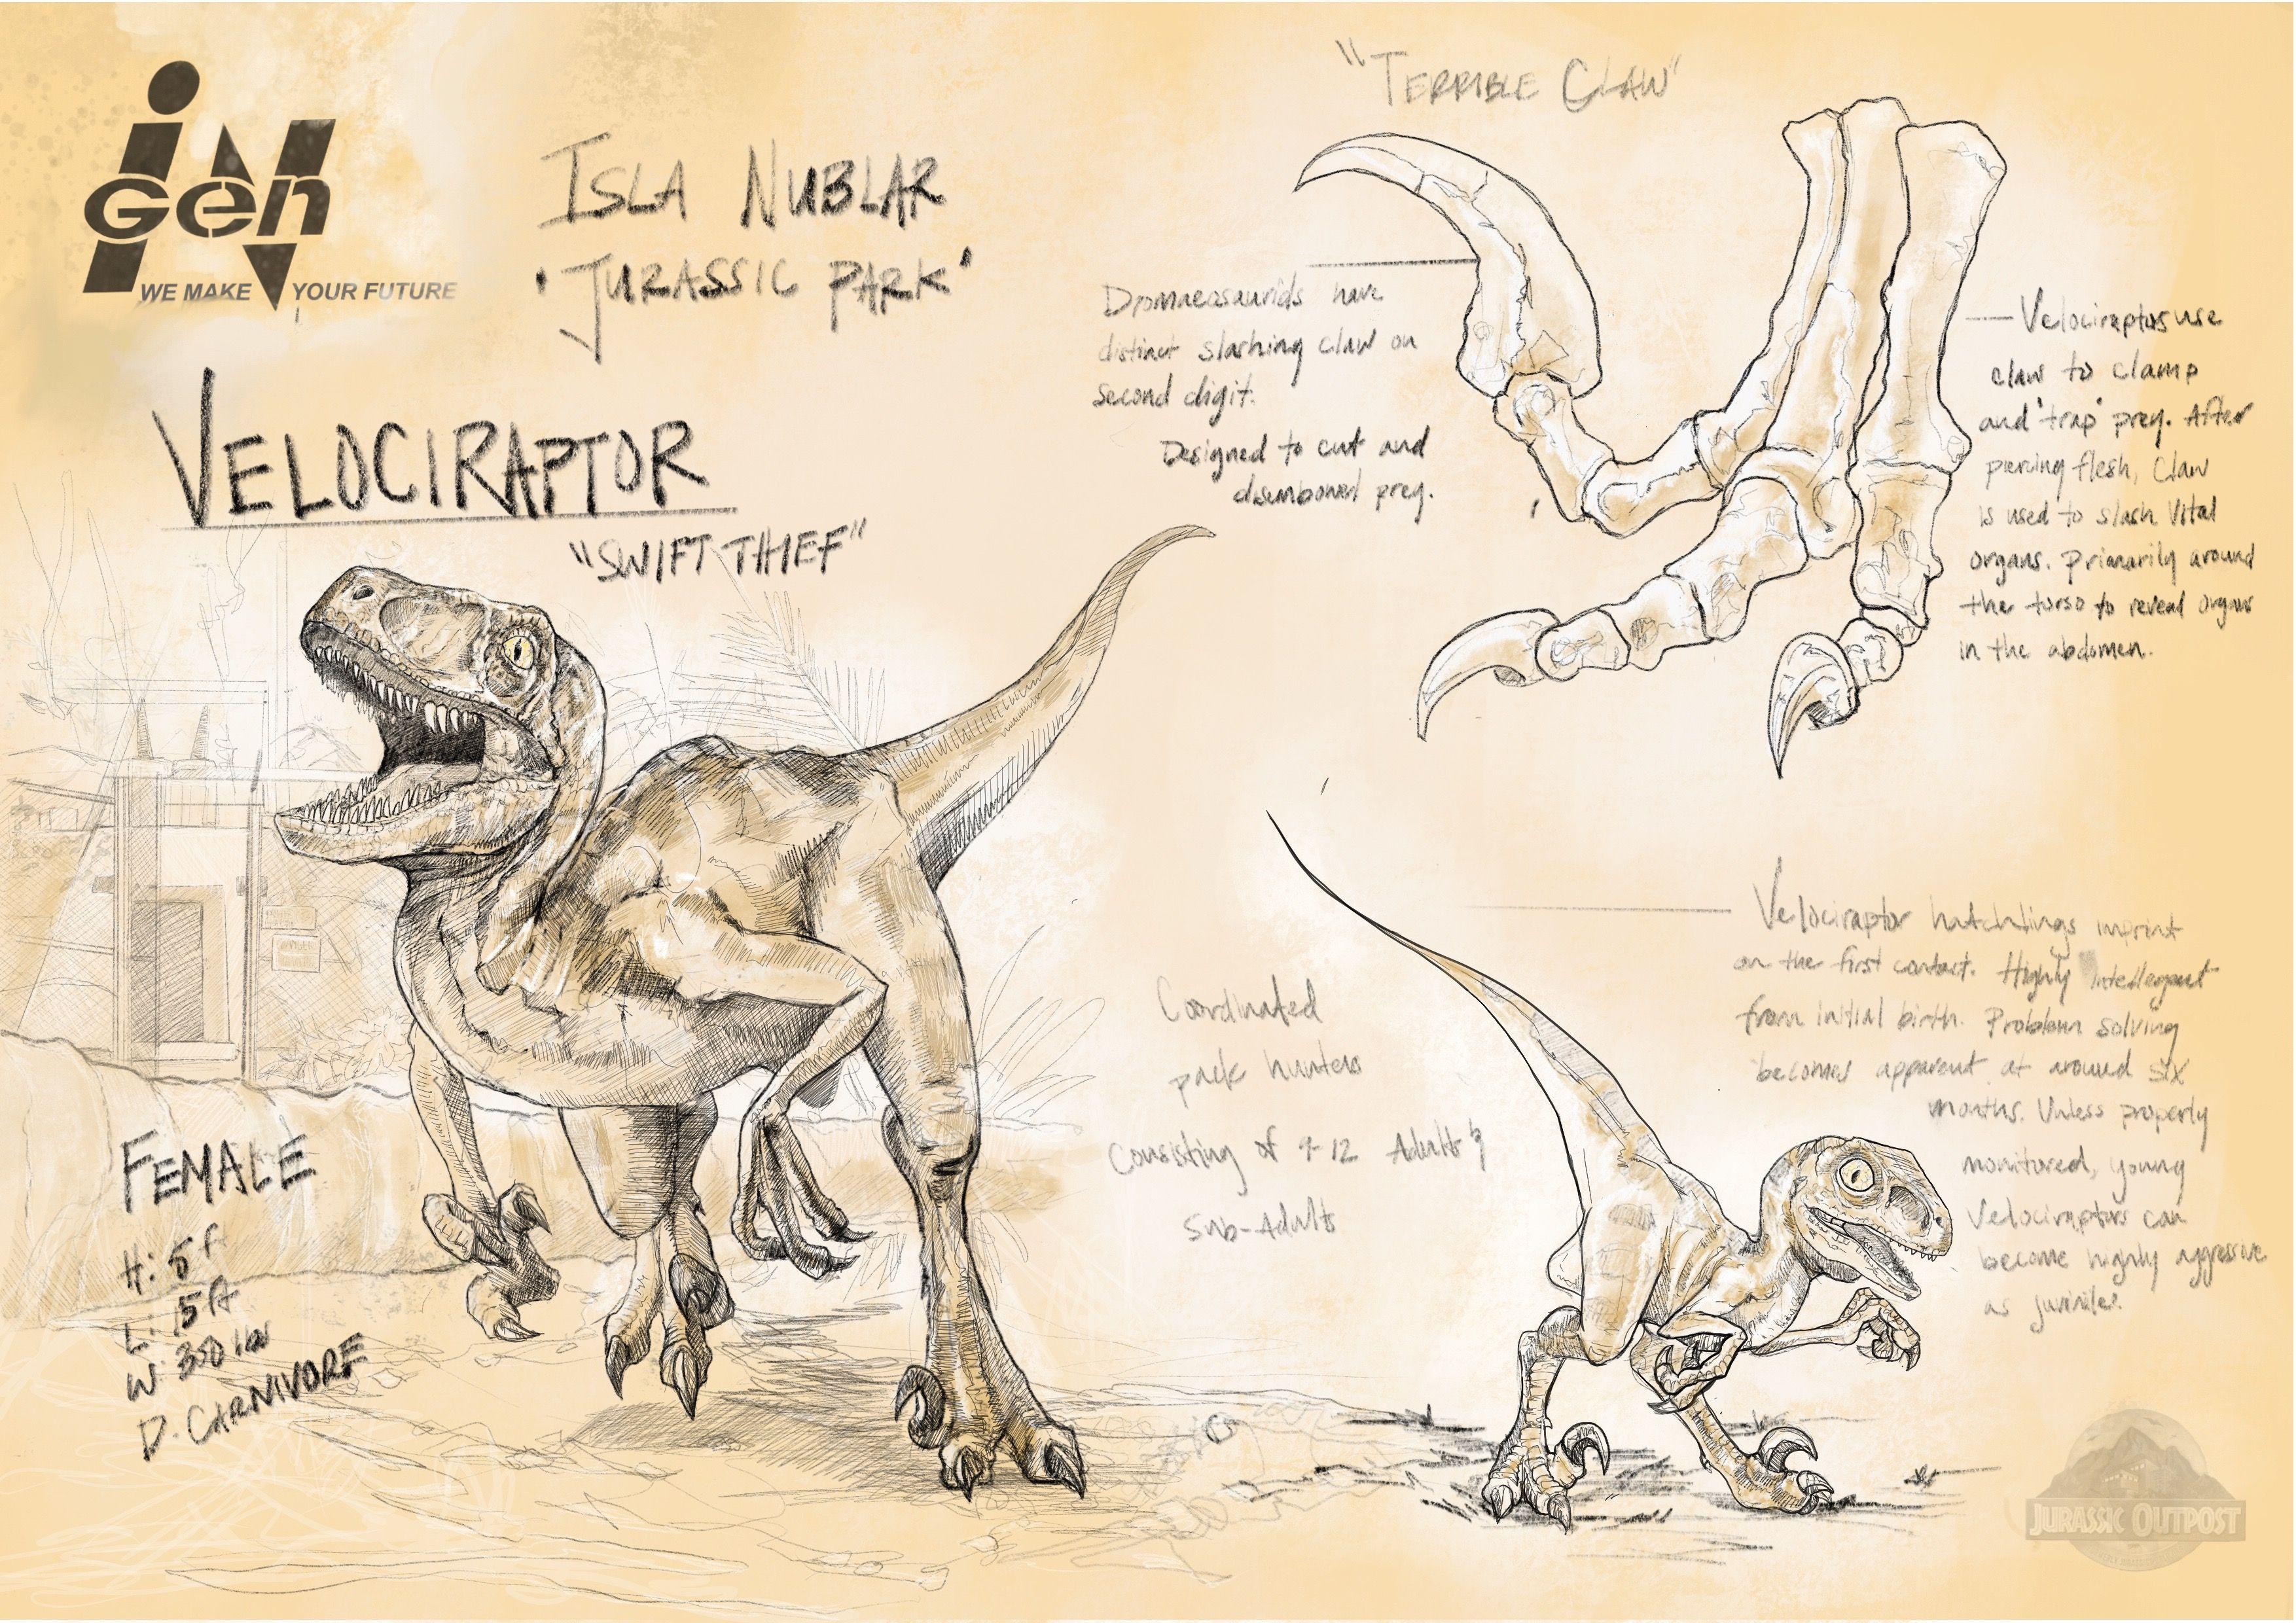 Velociraptor - | Dinosaur | Pinterest | Parque jurásico, Jurasico y ...